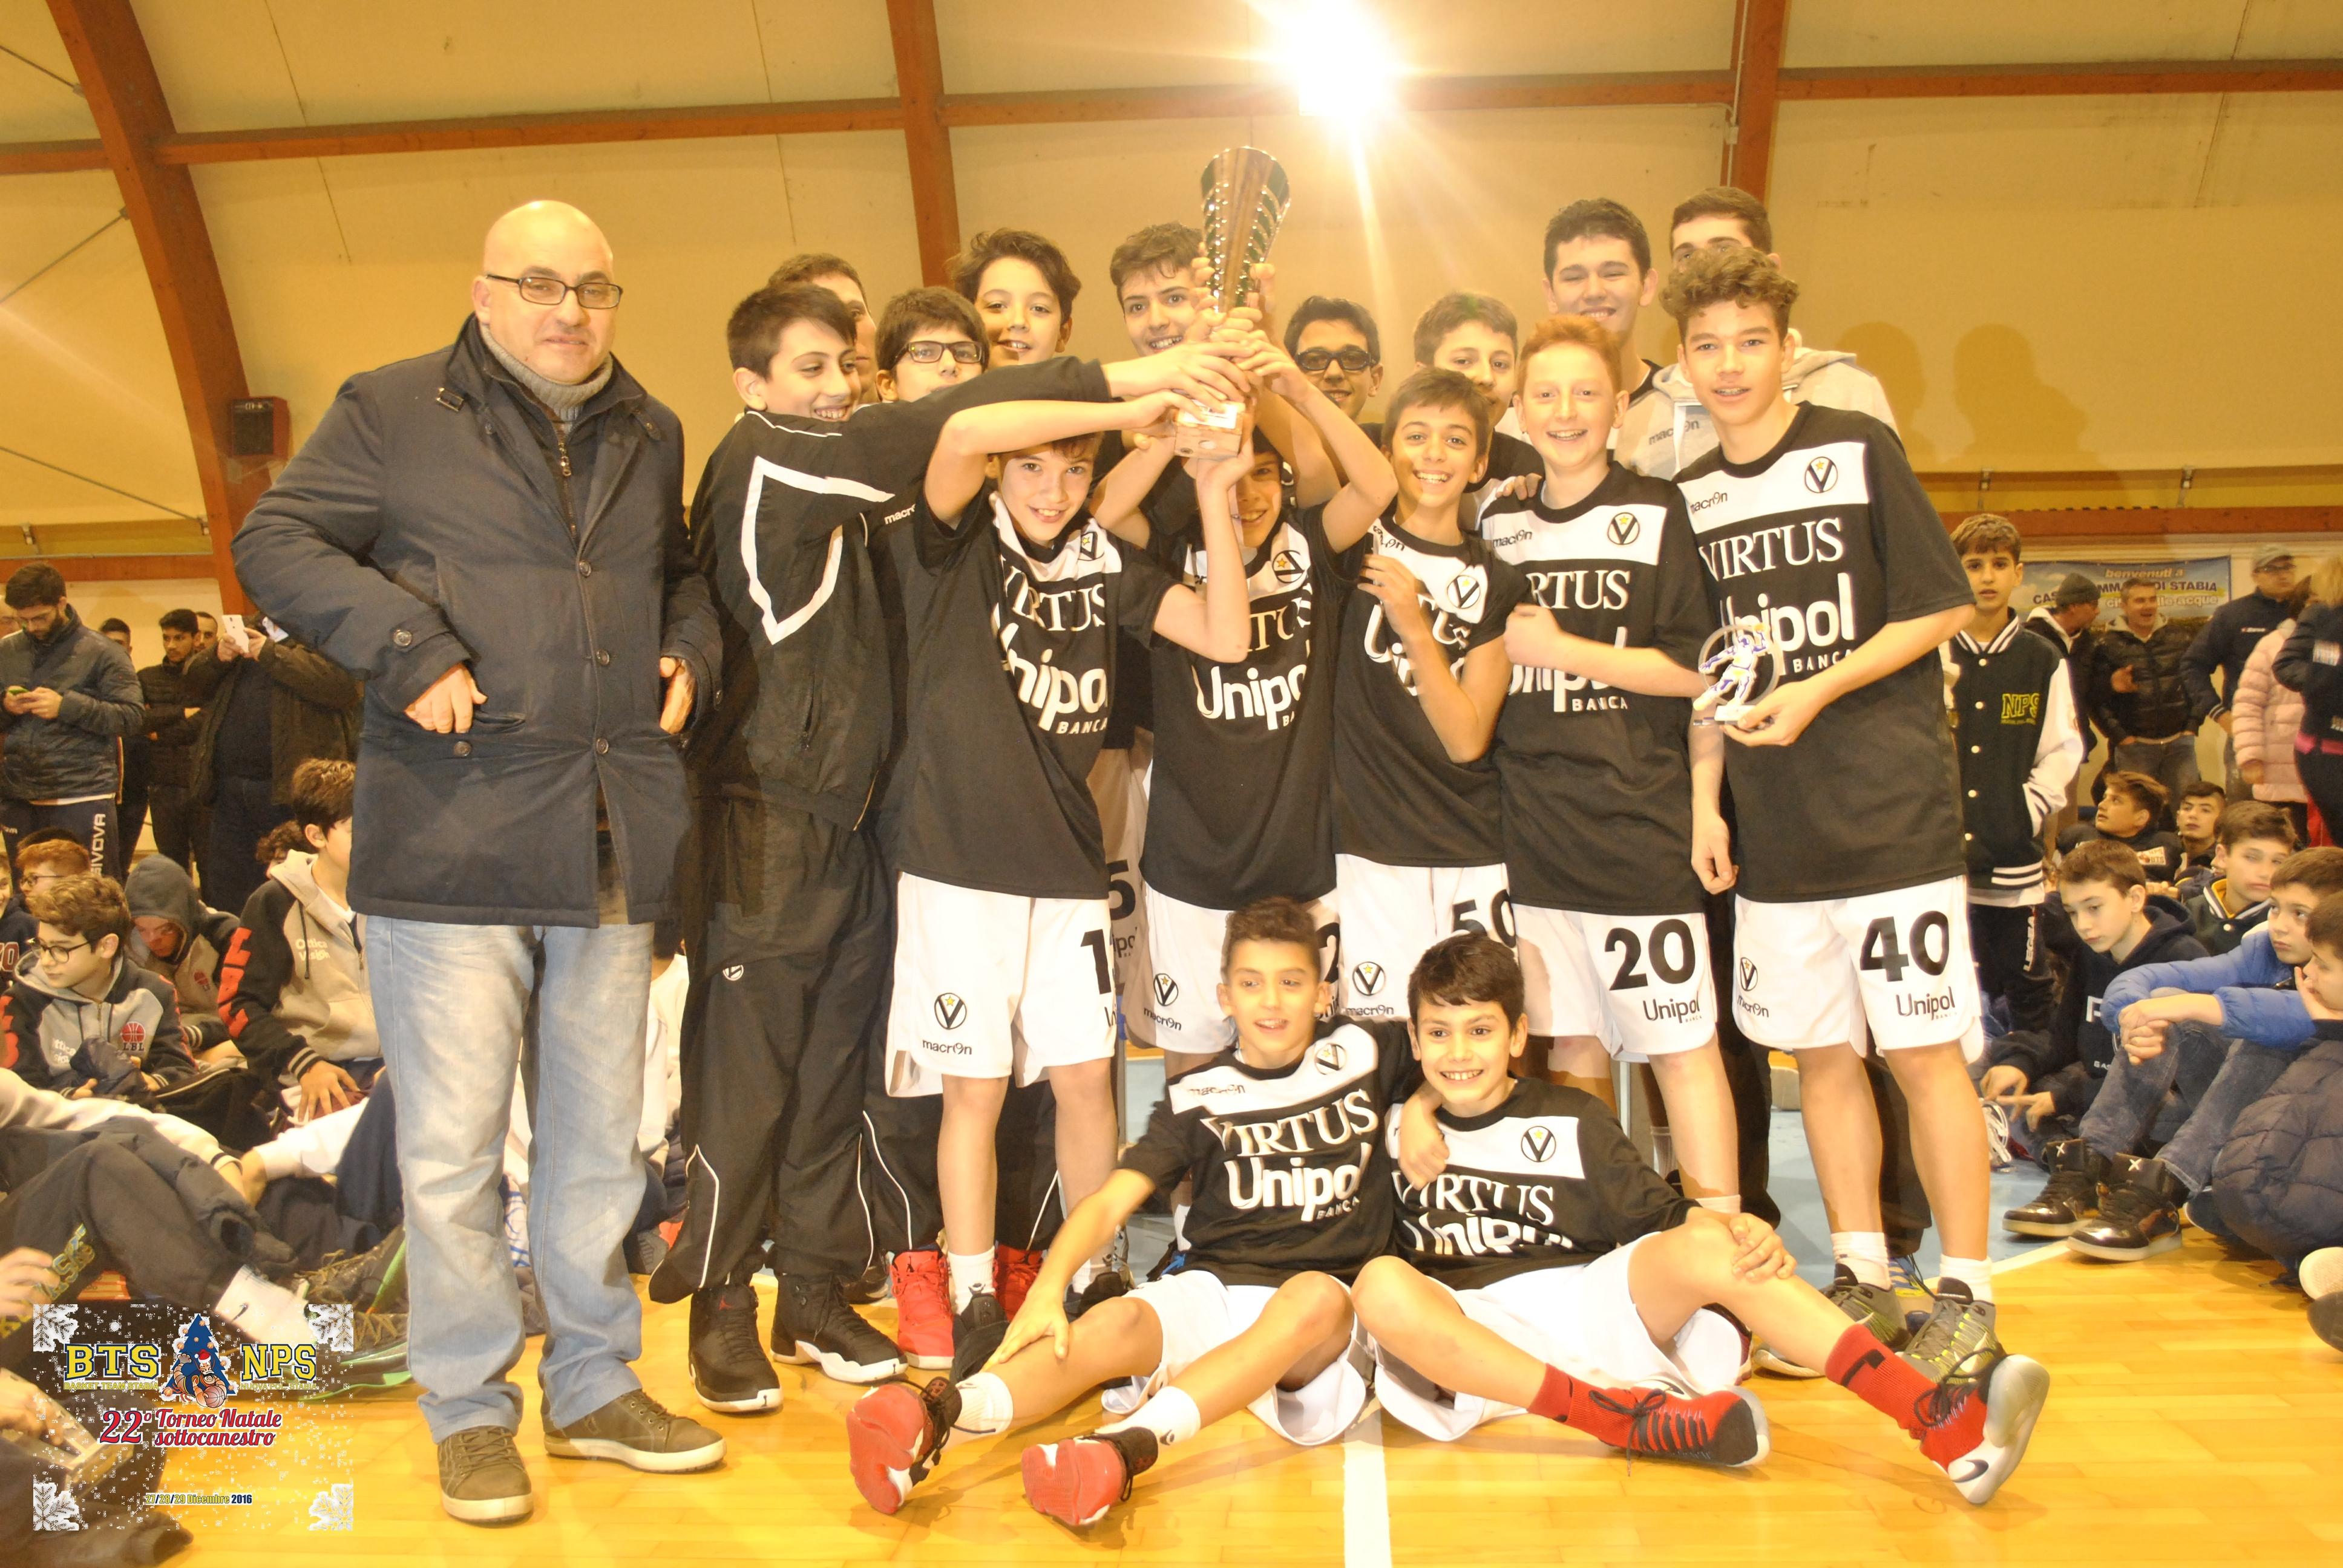 virtus-pallacanestro-bologna-trionfa-al-torneo-natale-sottocanestro